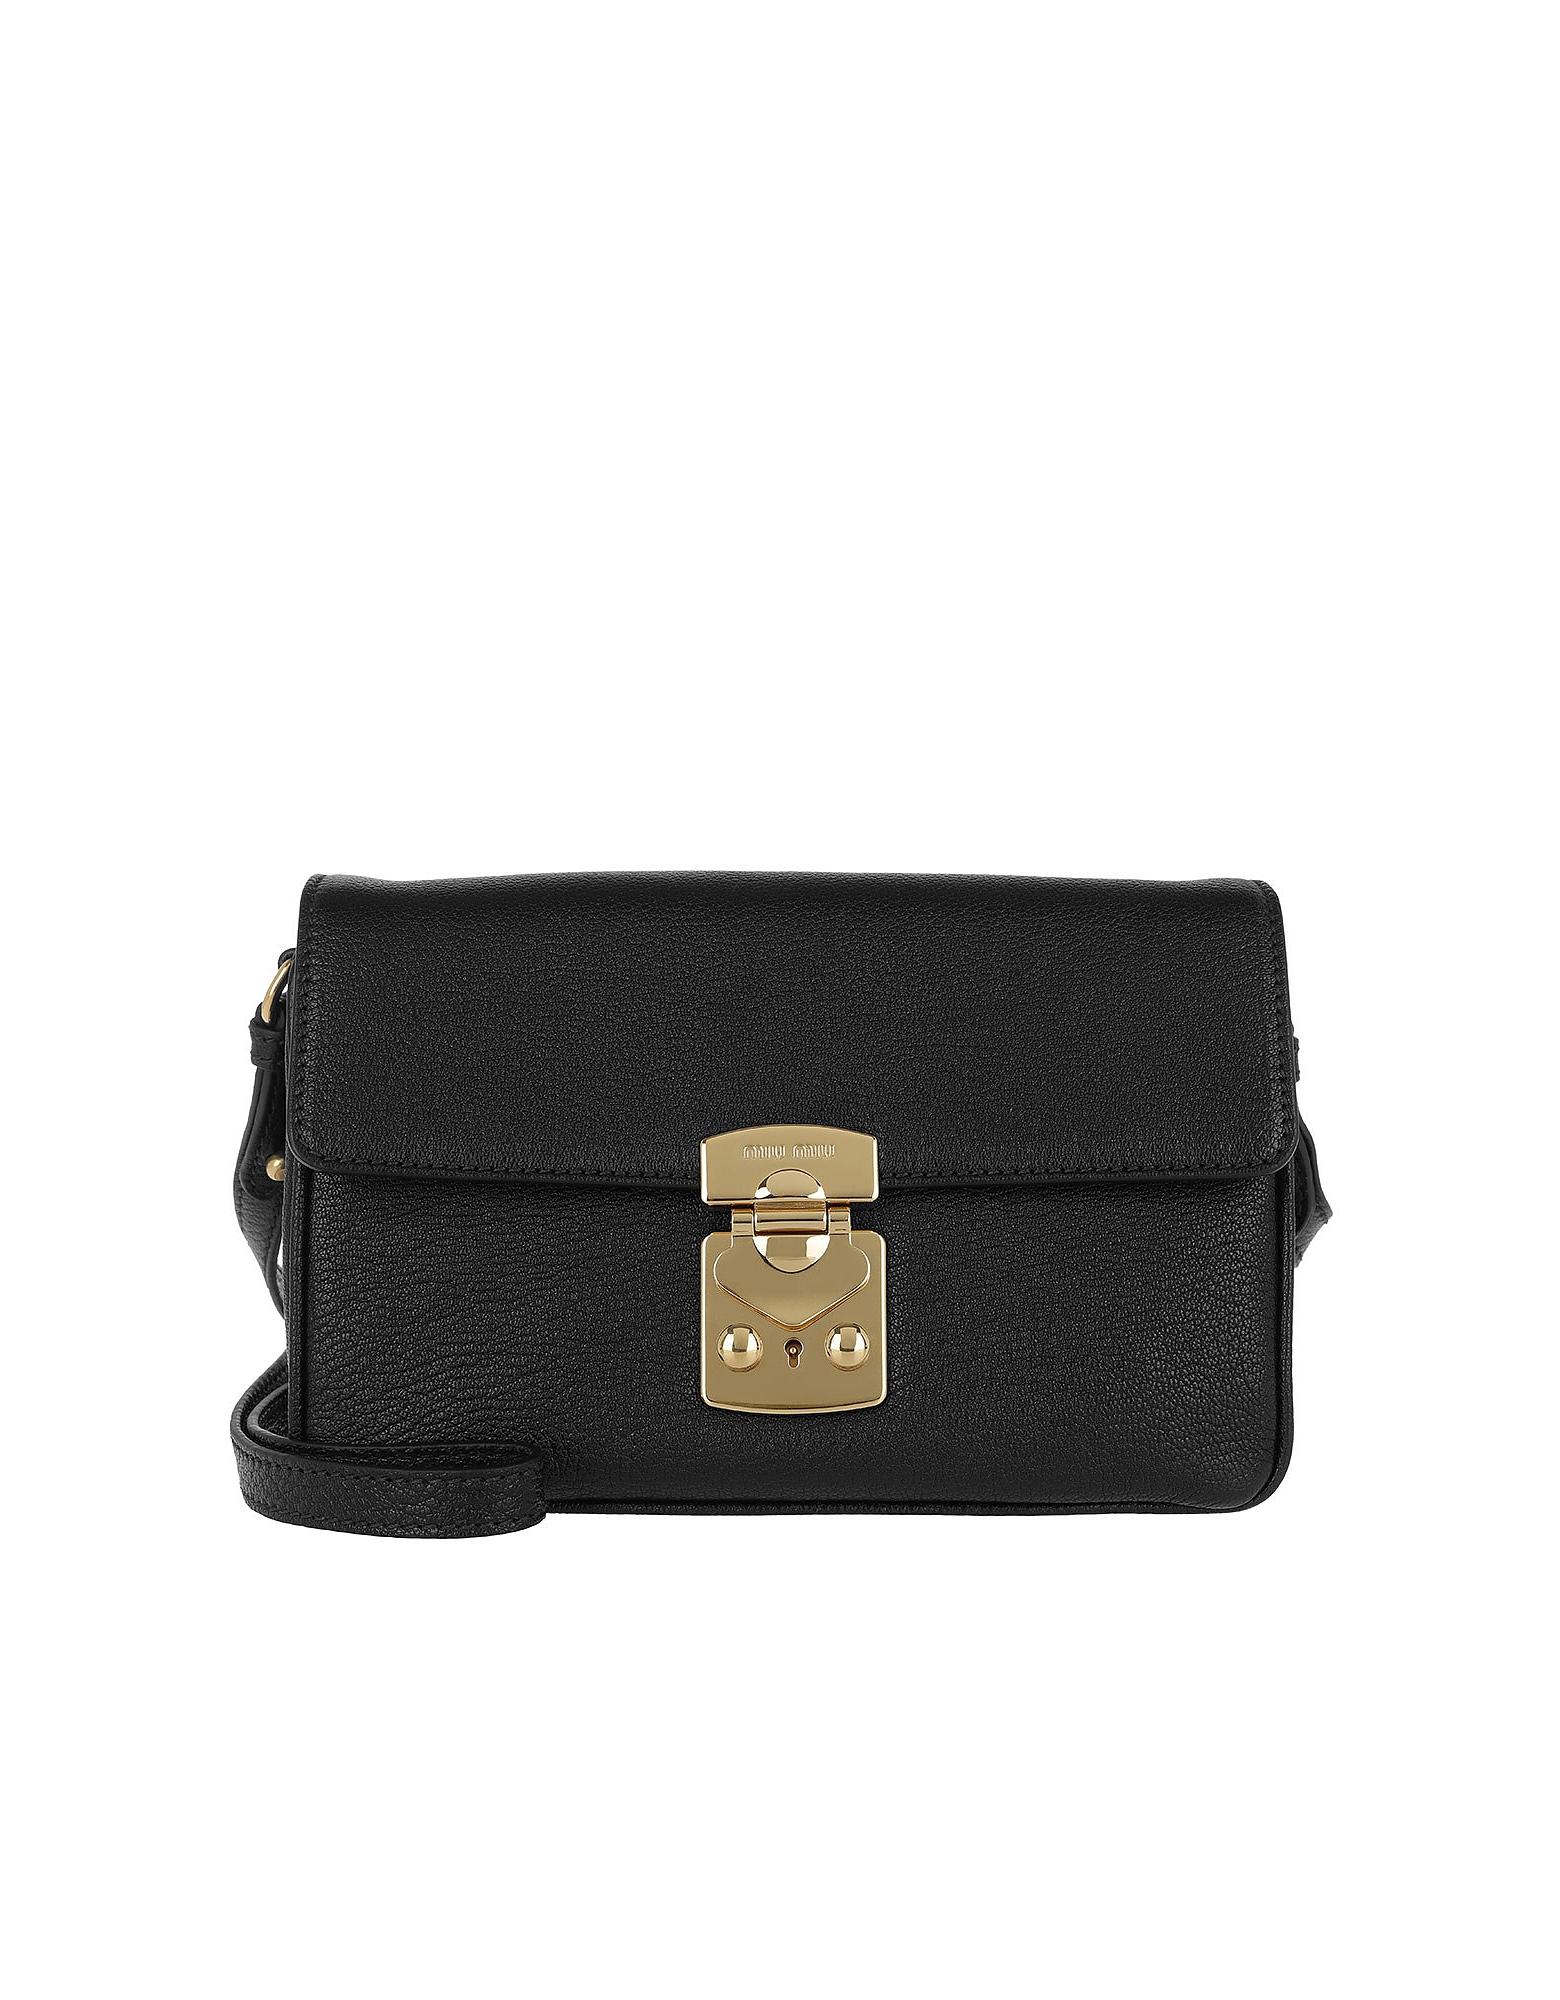 Miu Miu Handbags, Double Strap Crossbody Bag Black Black